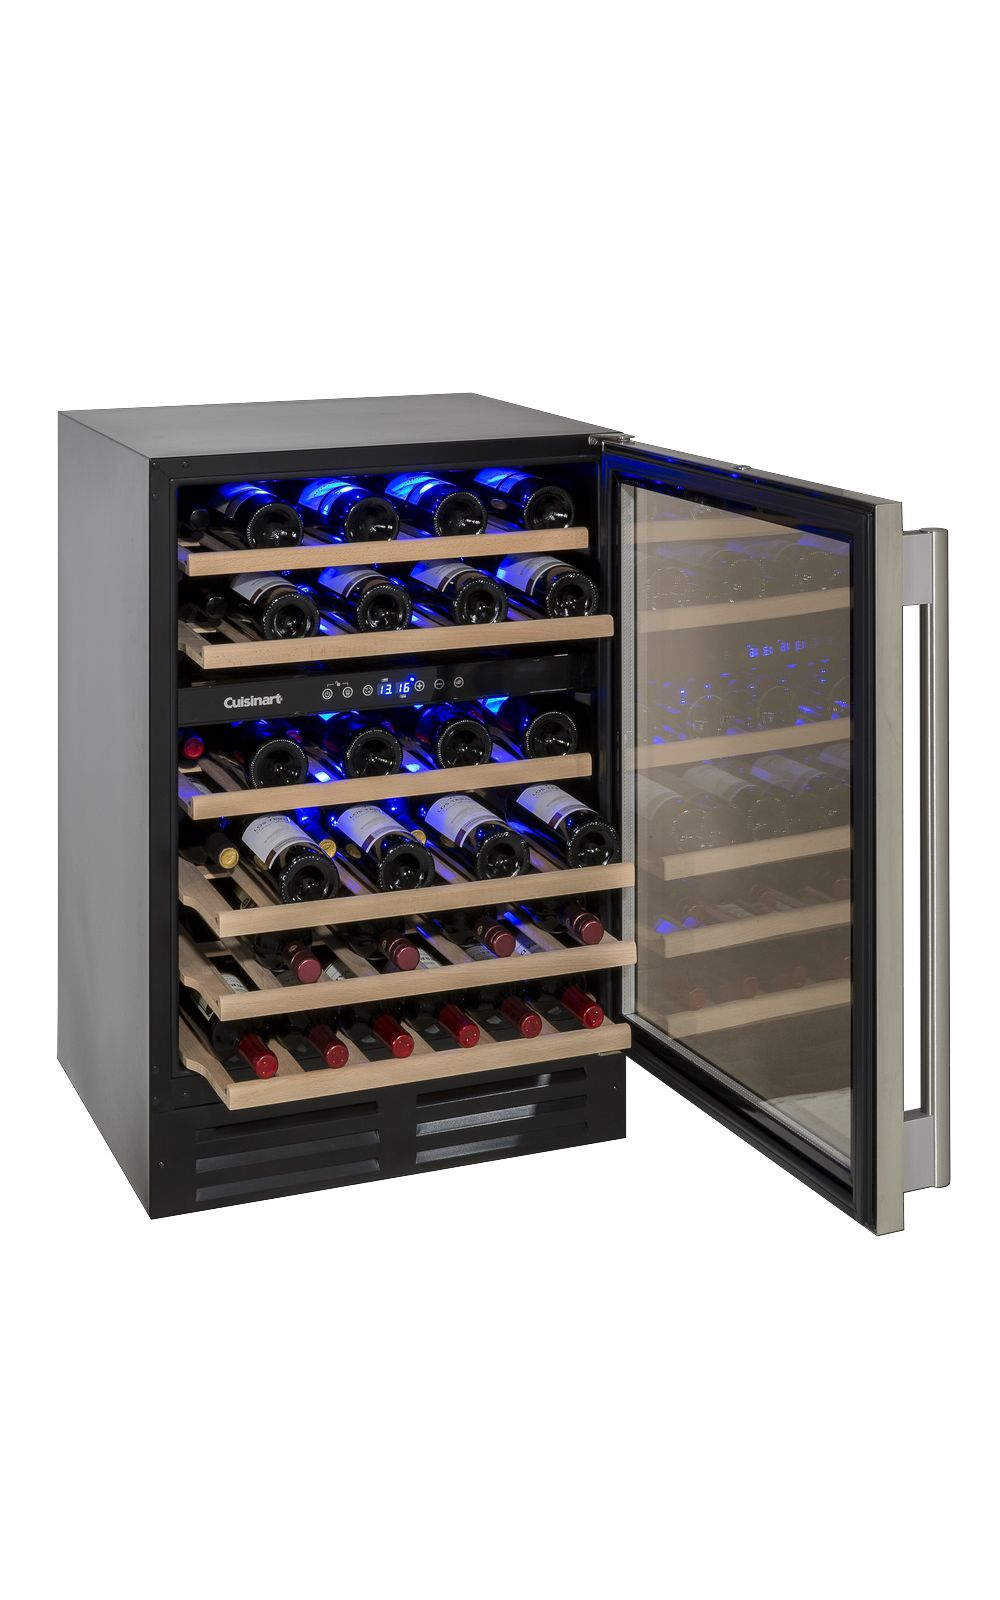 Foto 3 - Adega de Vinho 46 garrafas dual zone built in -220V prime cooking Cuisinart